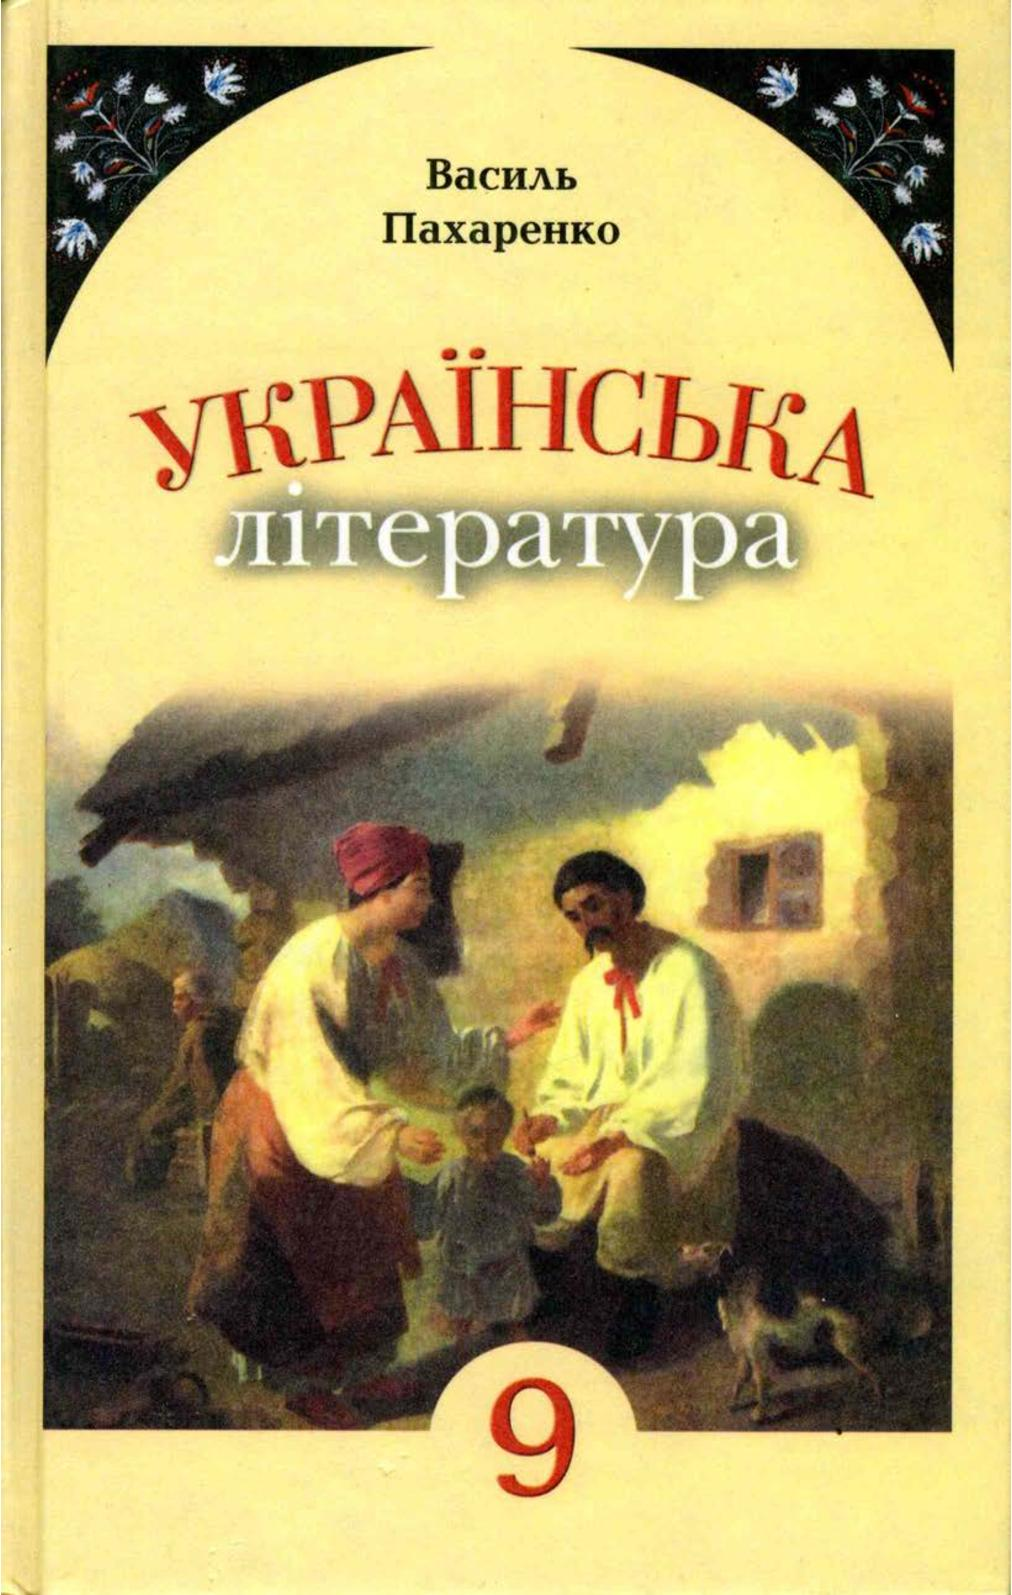 Calaméo - 9 клас. Українська література (Пахаренко) - 2009 41e4b58f7b976